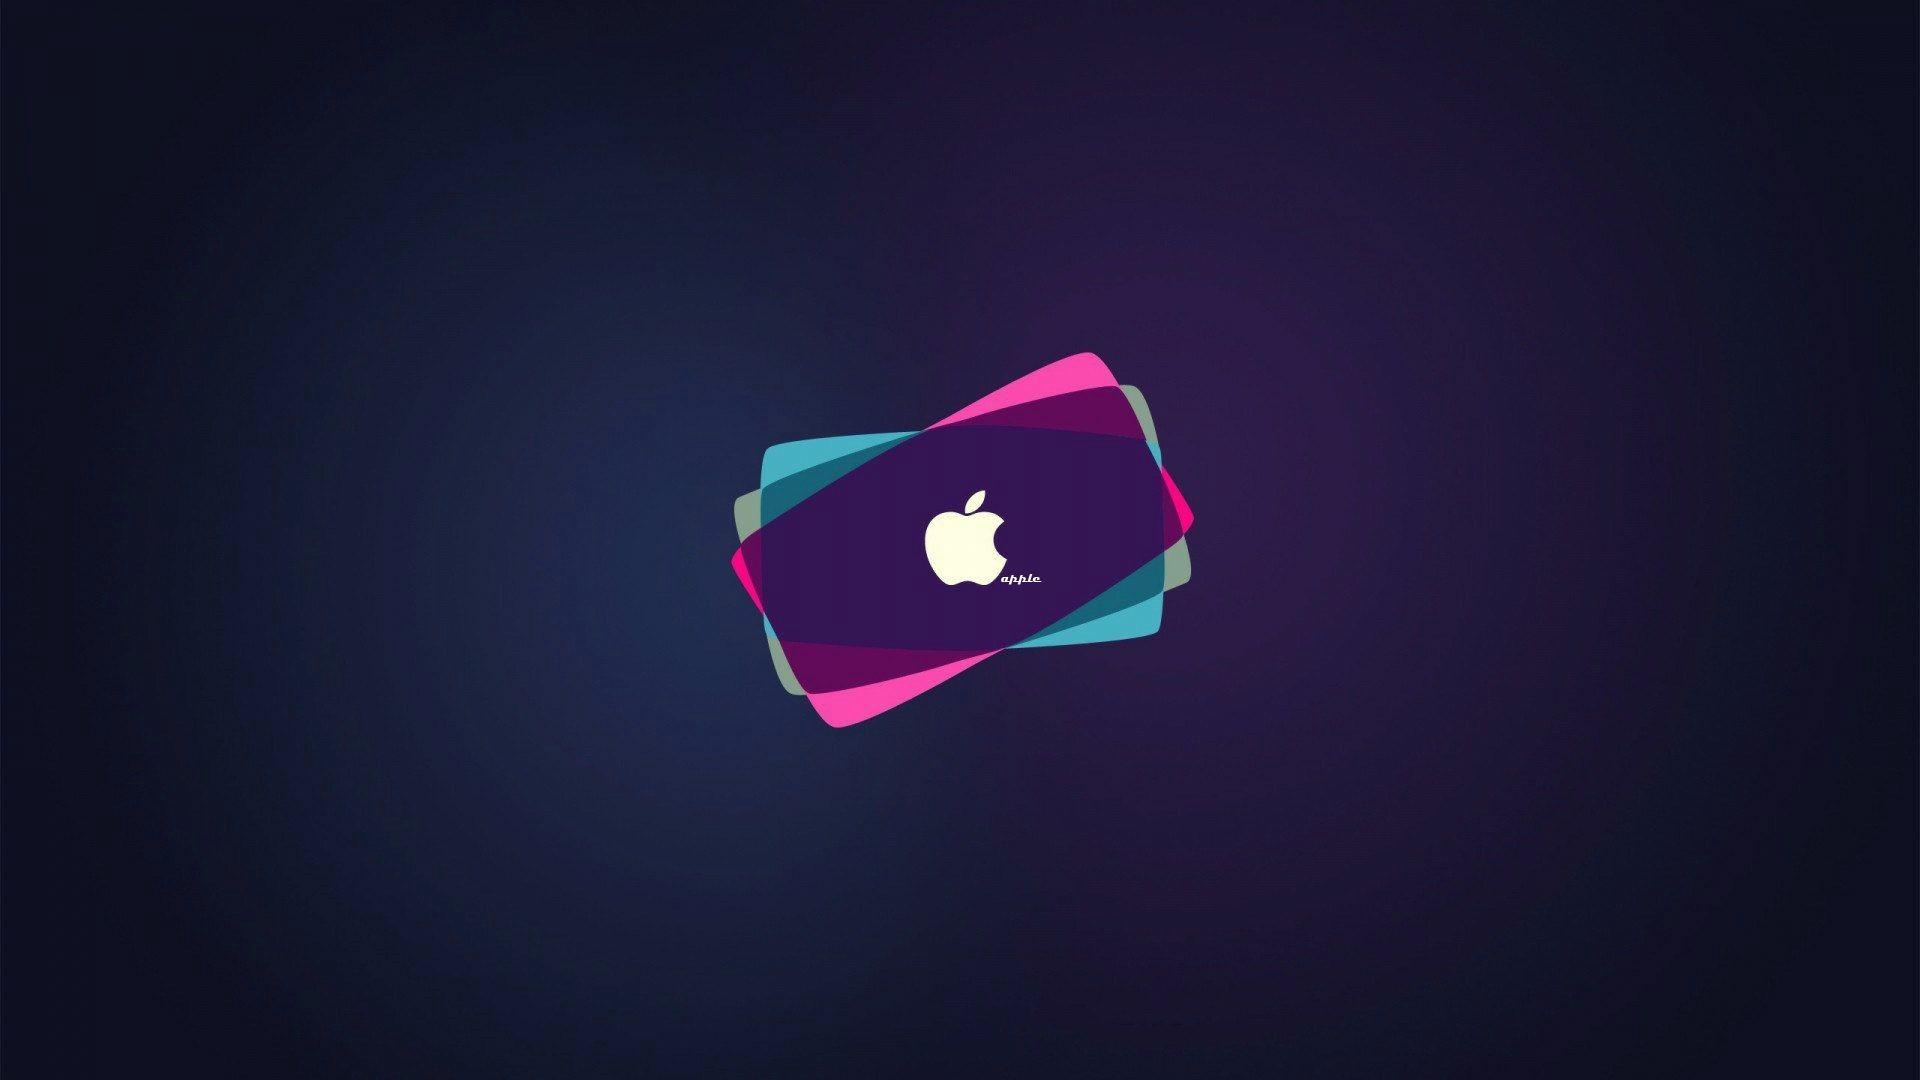 Macbook  обои и картинки на рабочий стол